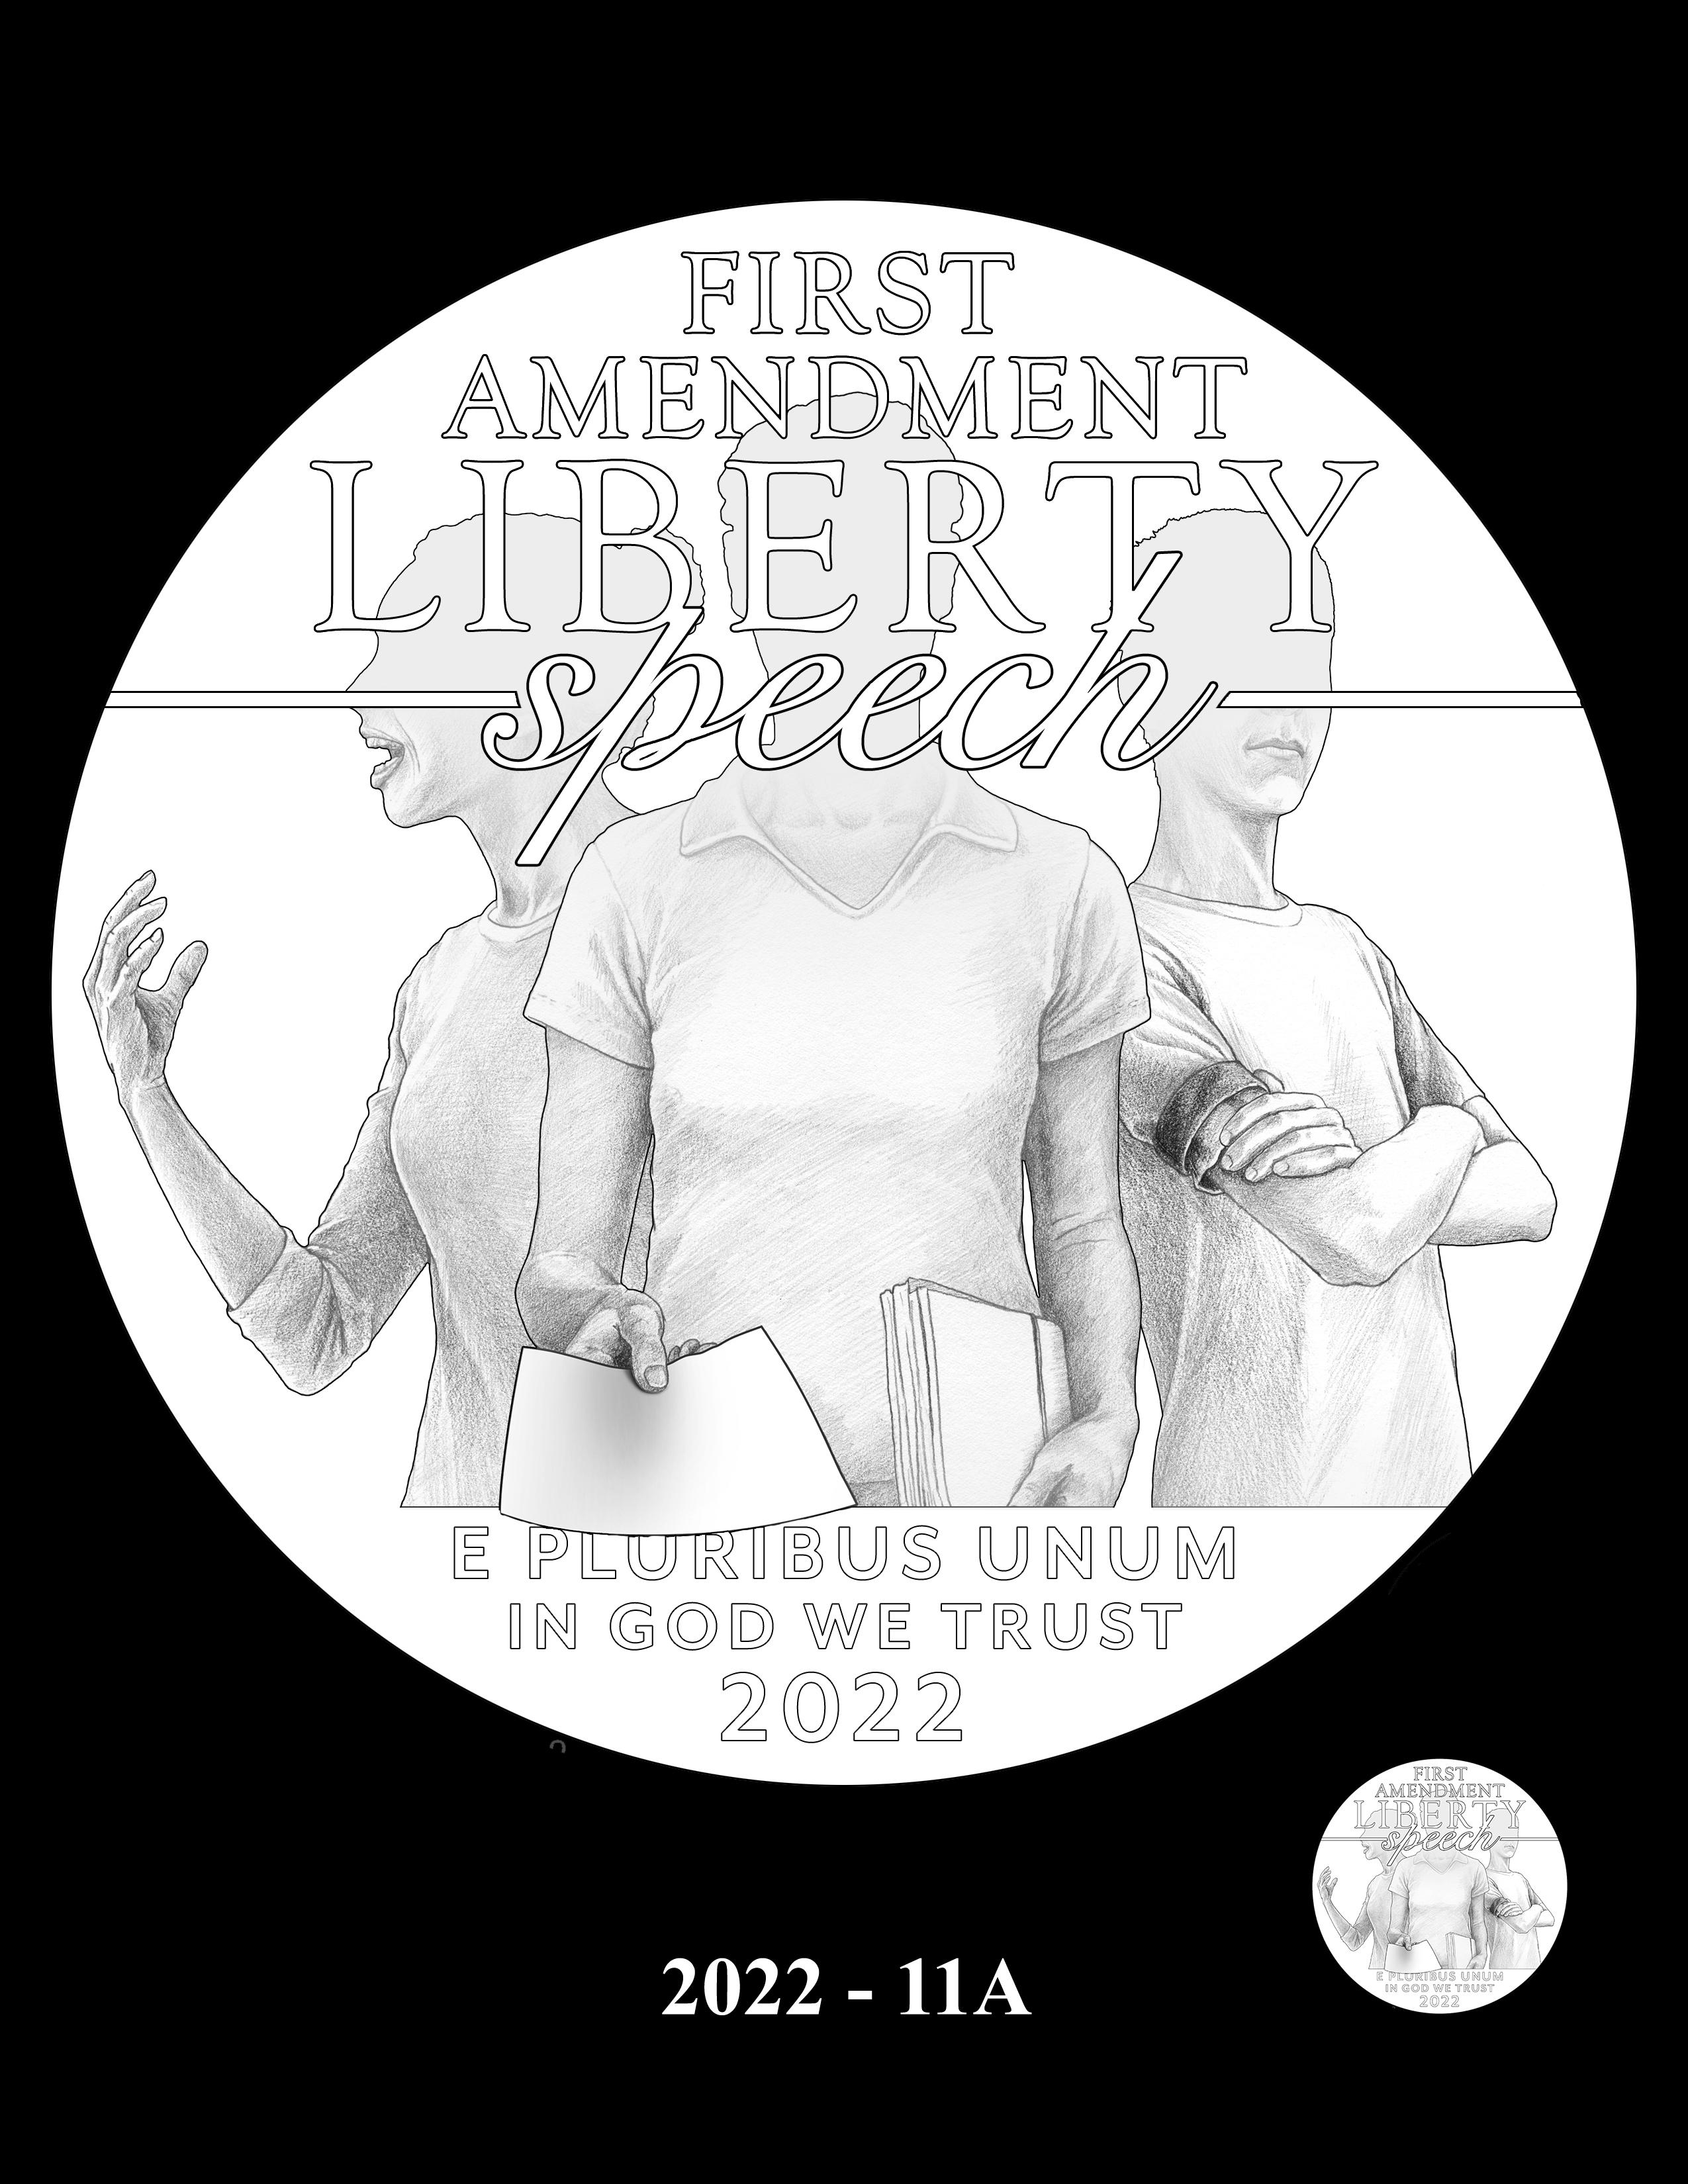 11A-2022 -- 2021 - 2025 American Eagle Platinum Proof Program